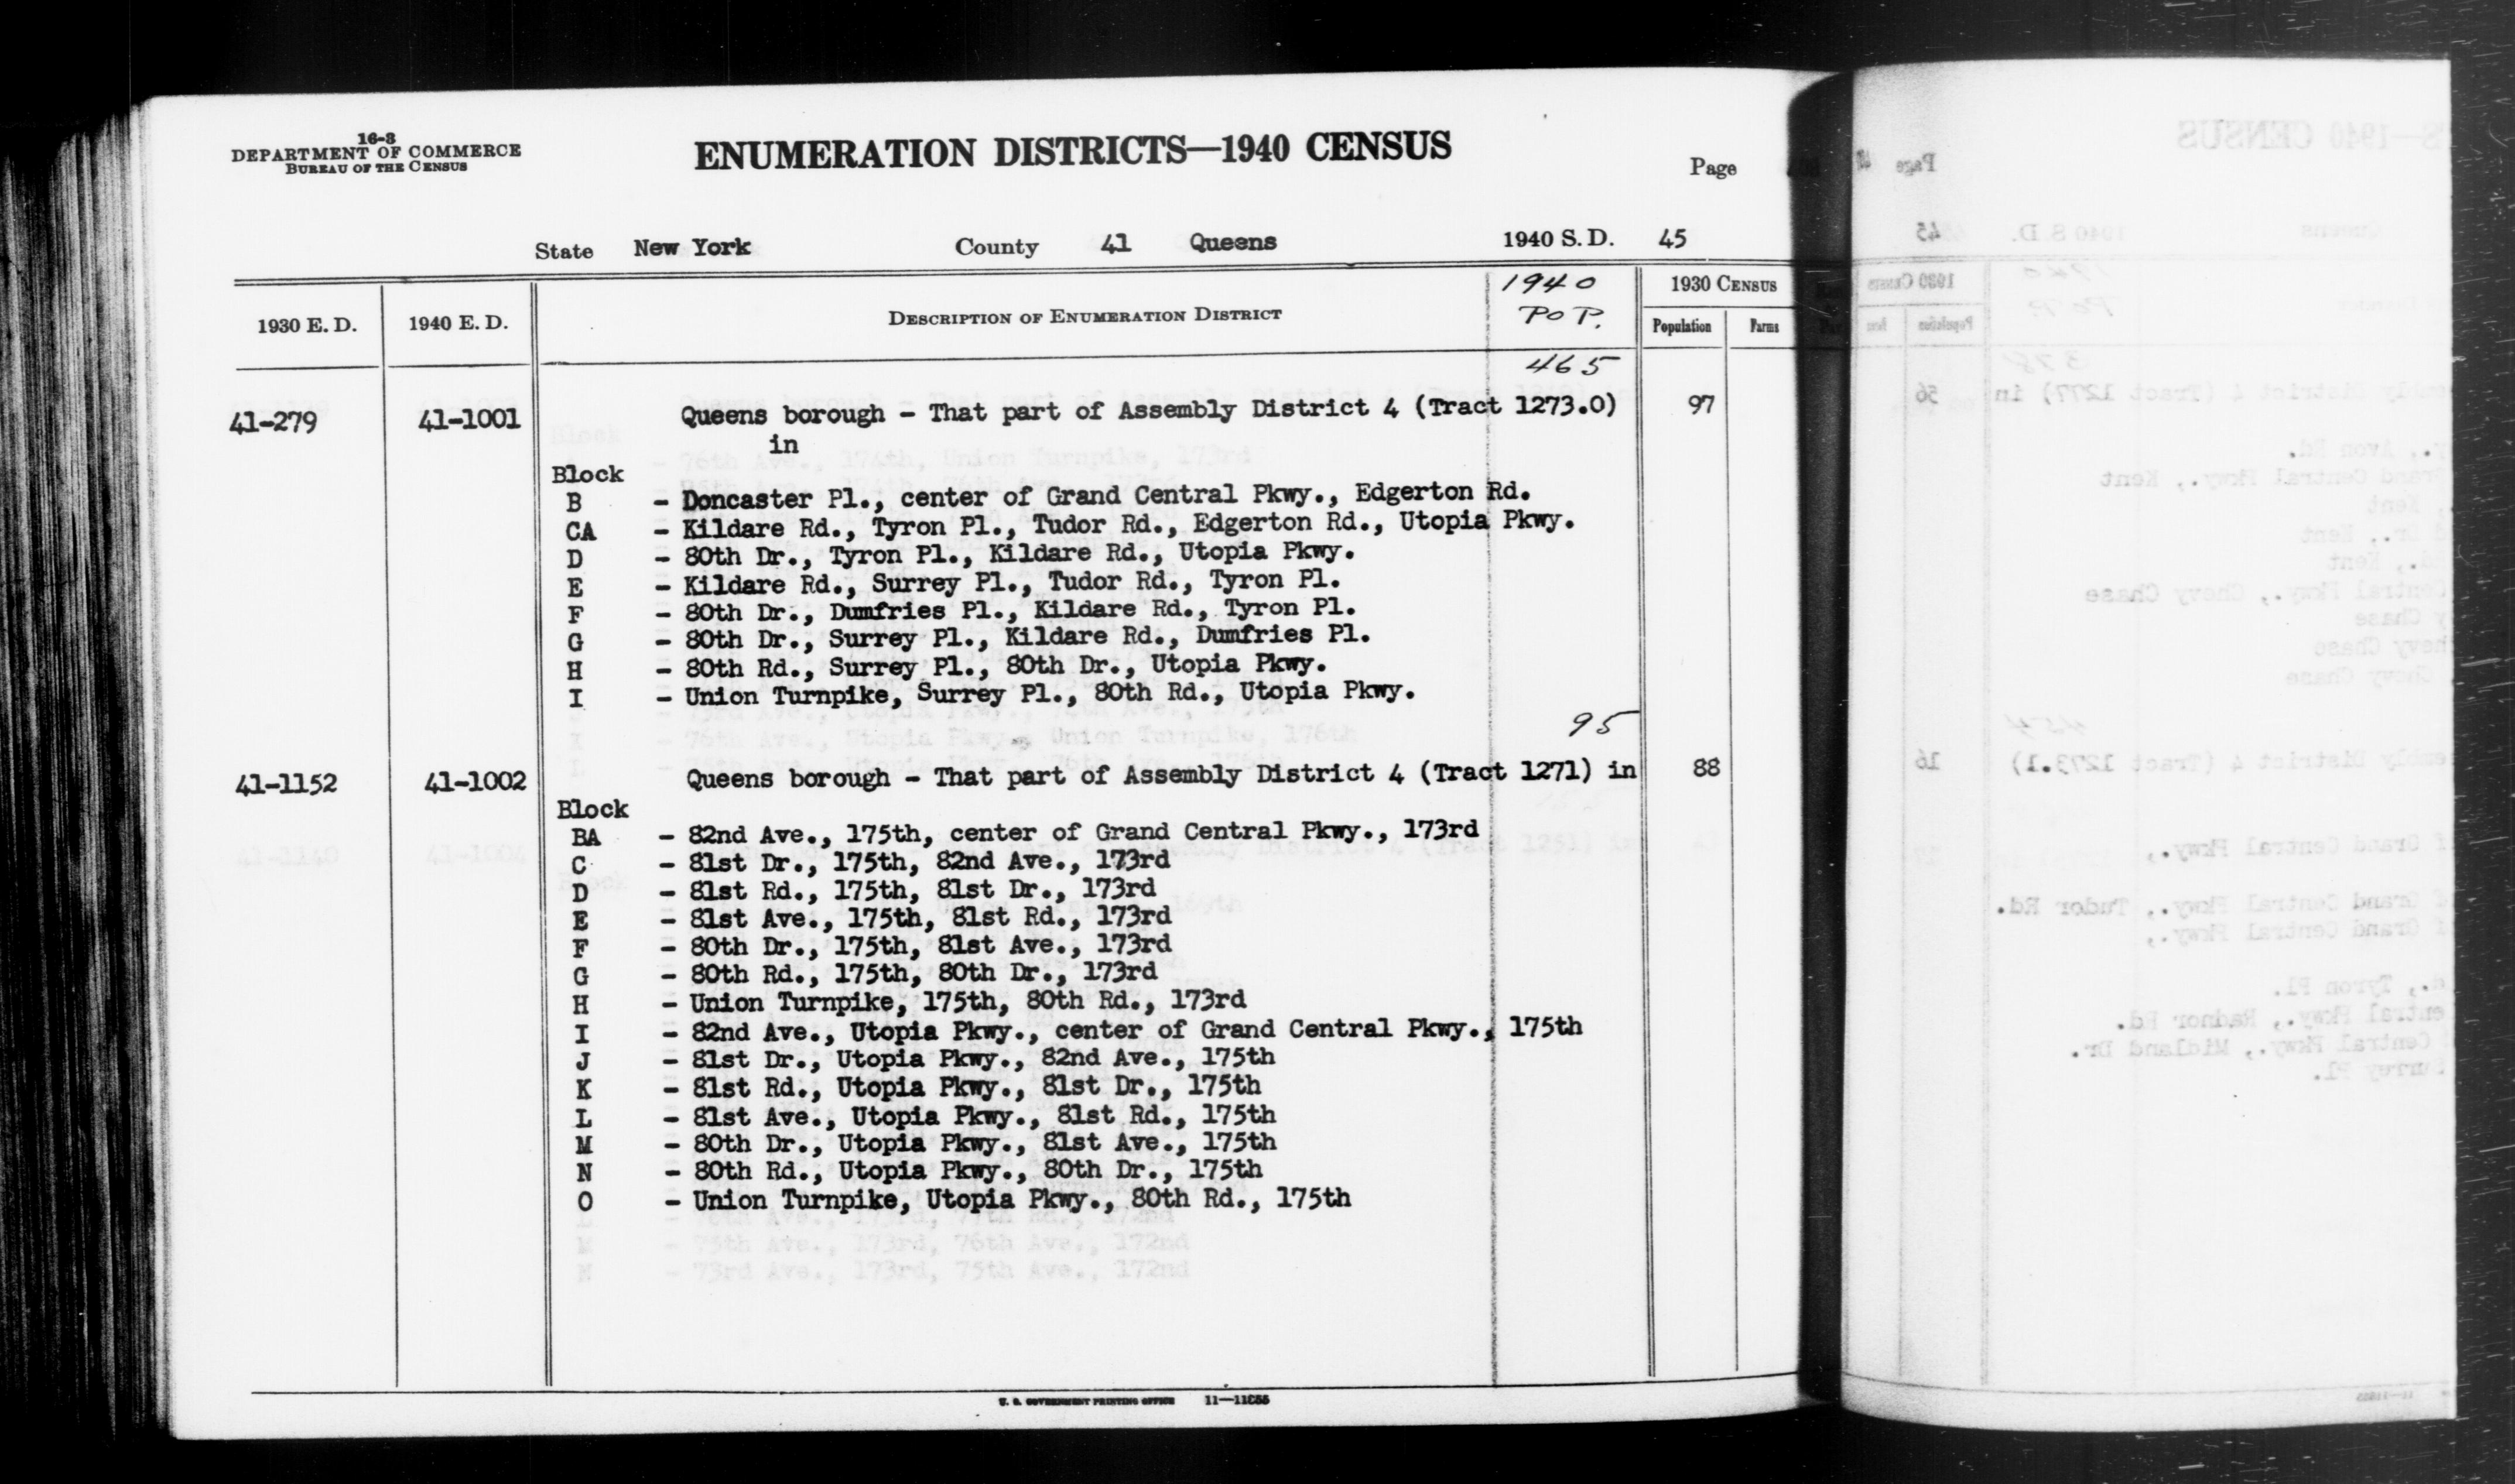 1940 Census Enumeration District Descriptions - New York - Queens County - ED 41-1001, ED 41-1002